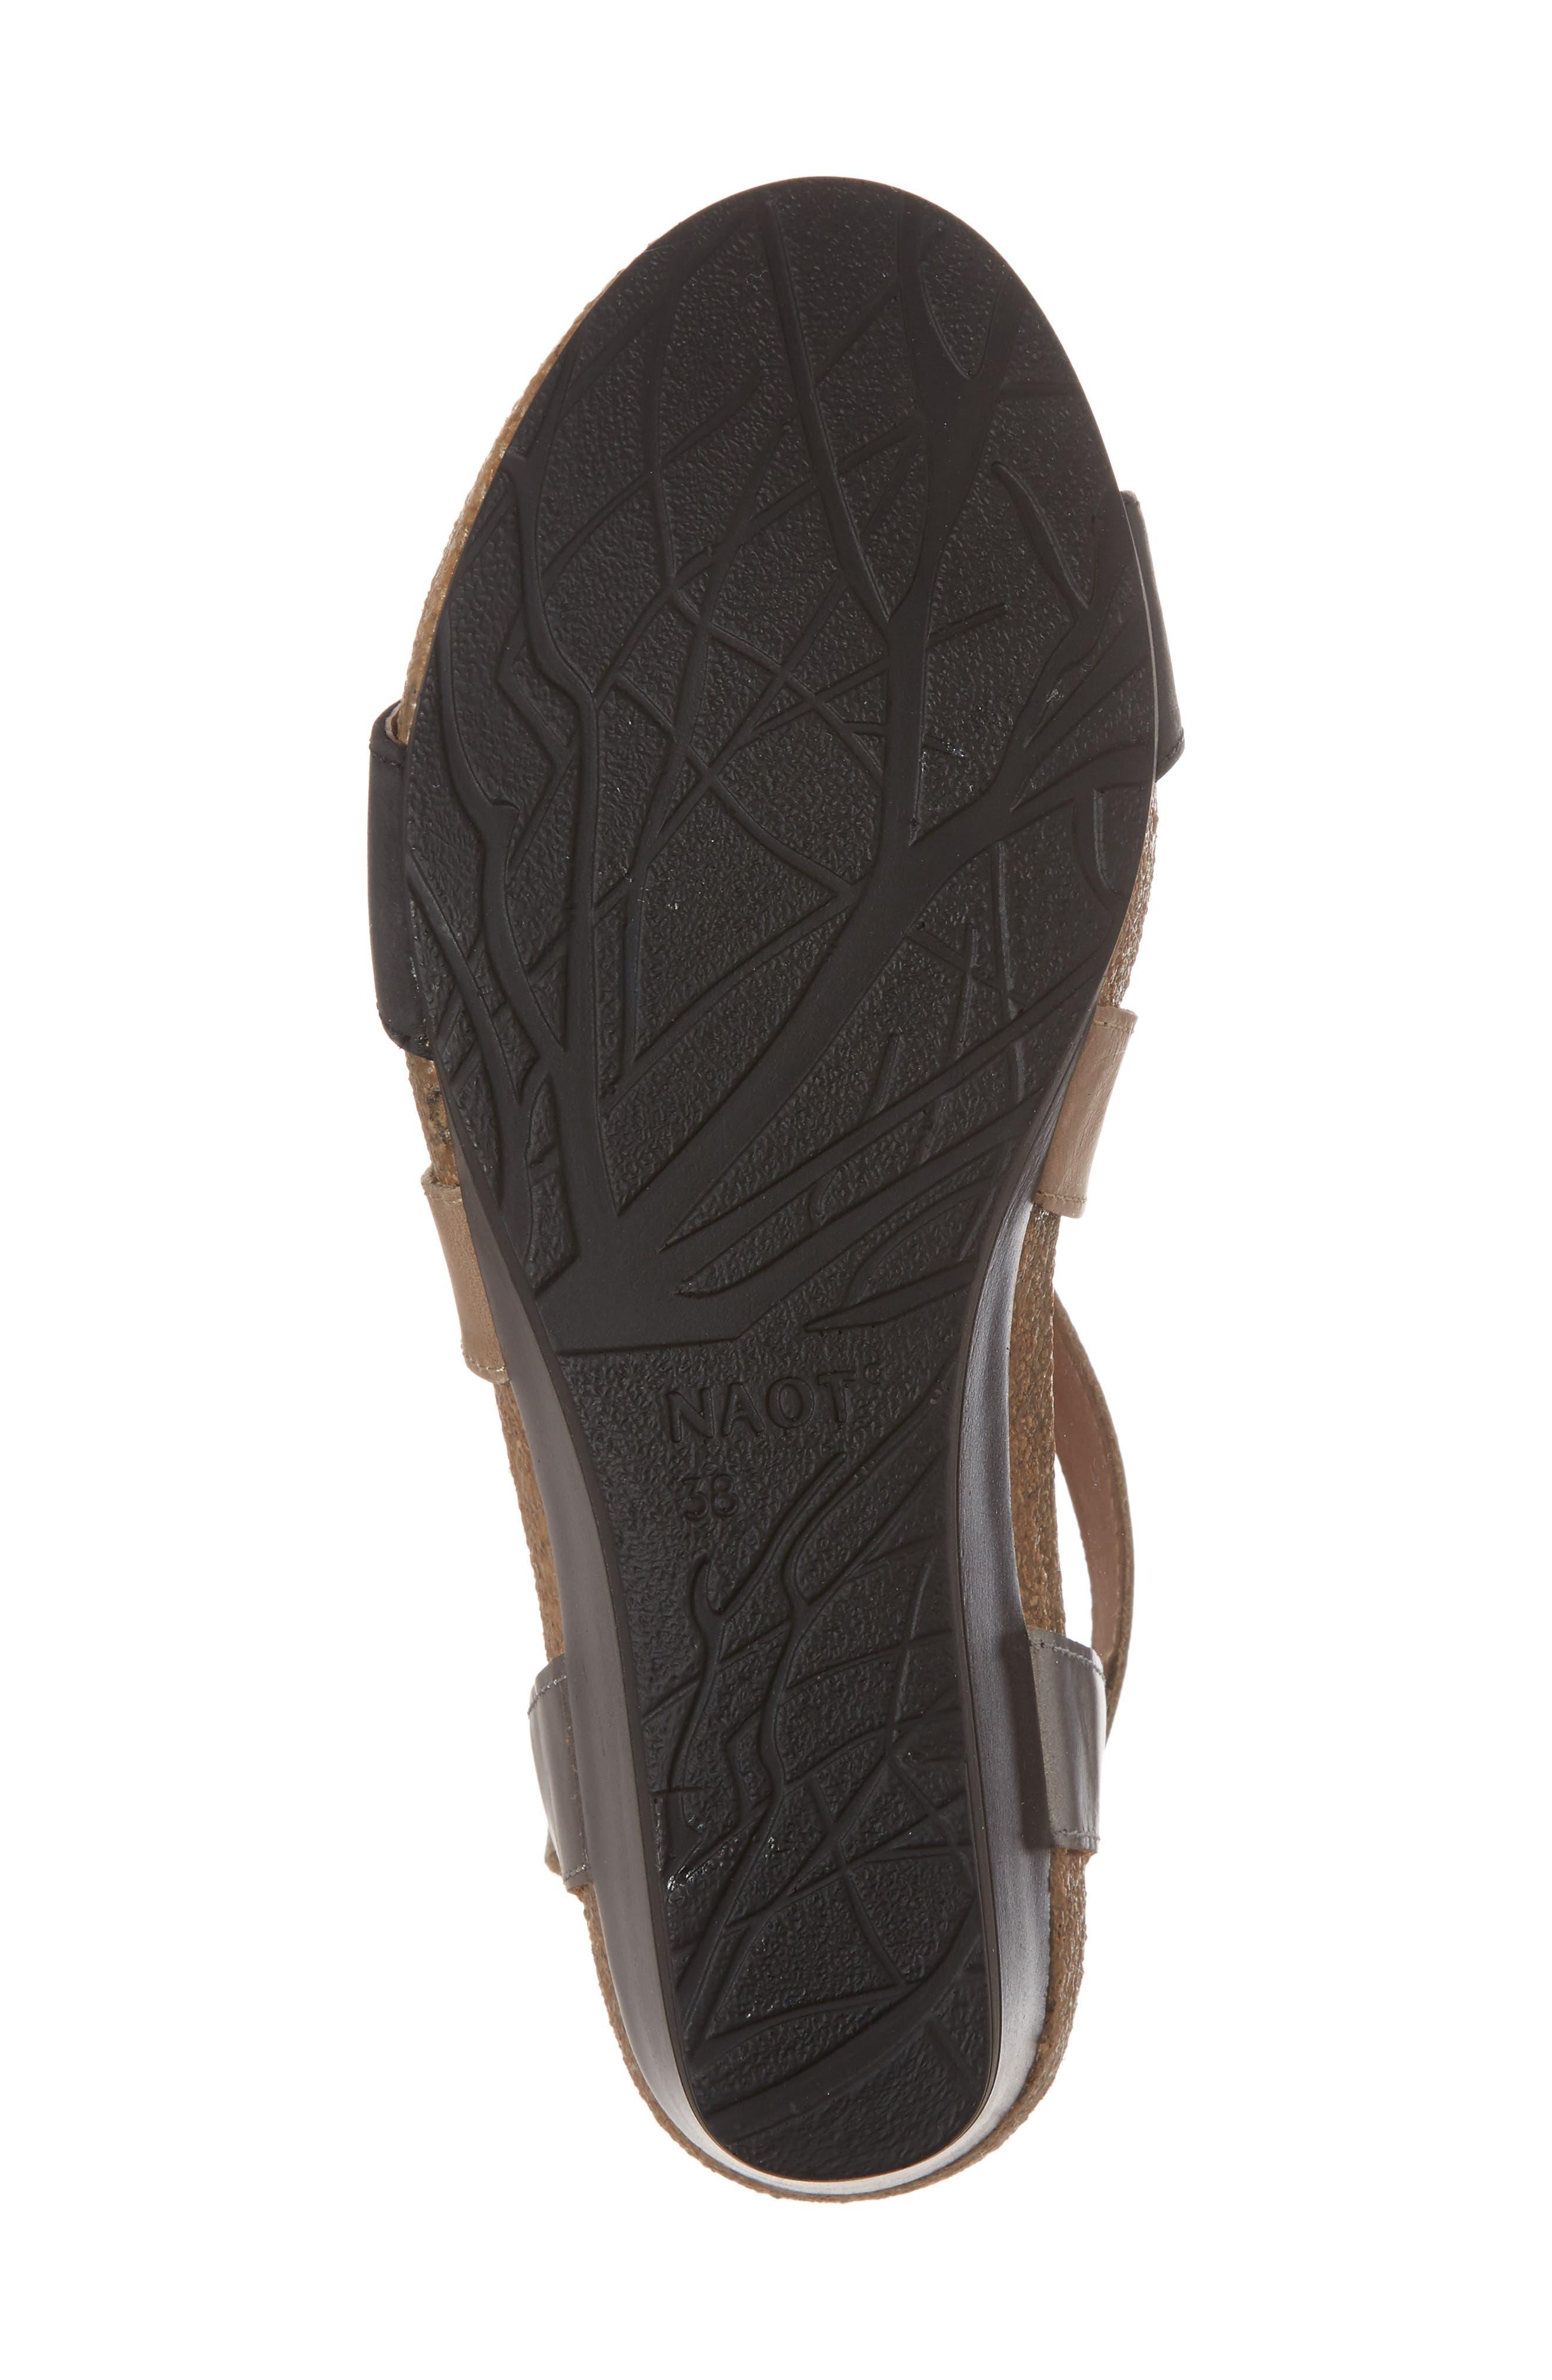 NAOT, Vixen Wedge Sandal, Alternate thumbnail 6, color, OILY COAL LEATHER